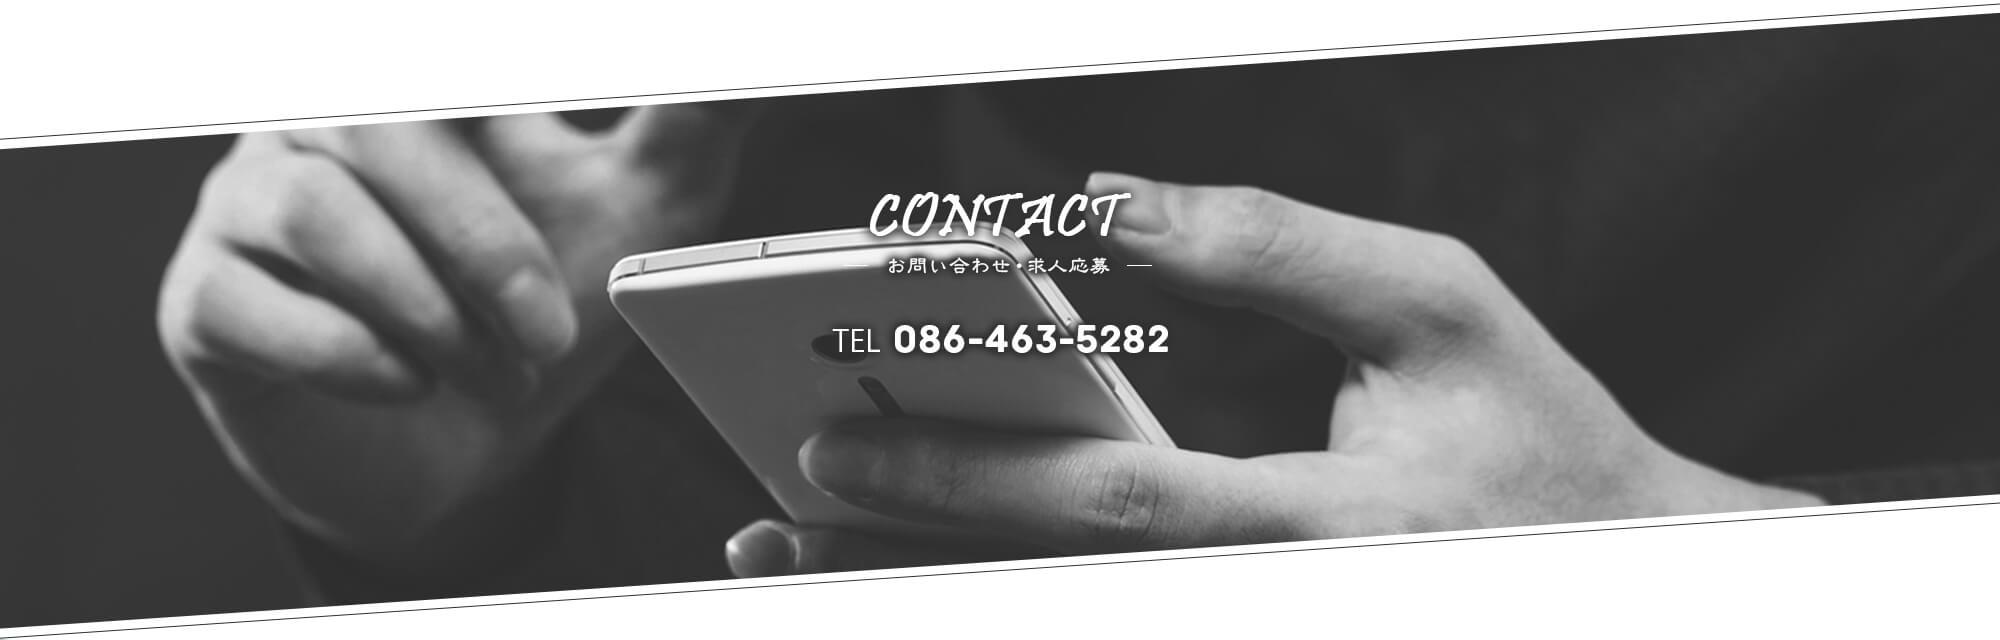 bnr_contact_bg